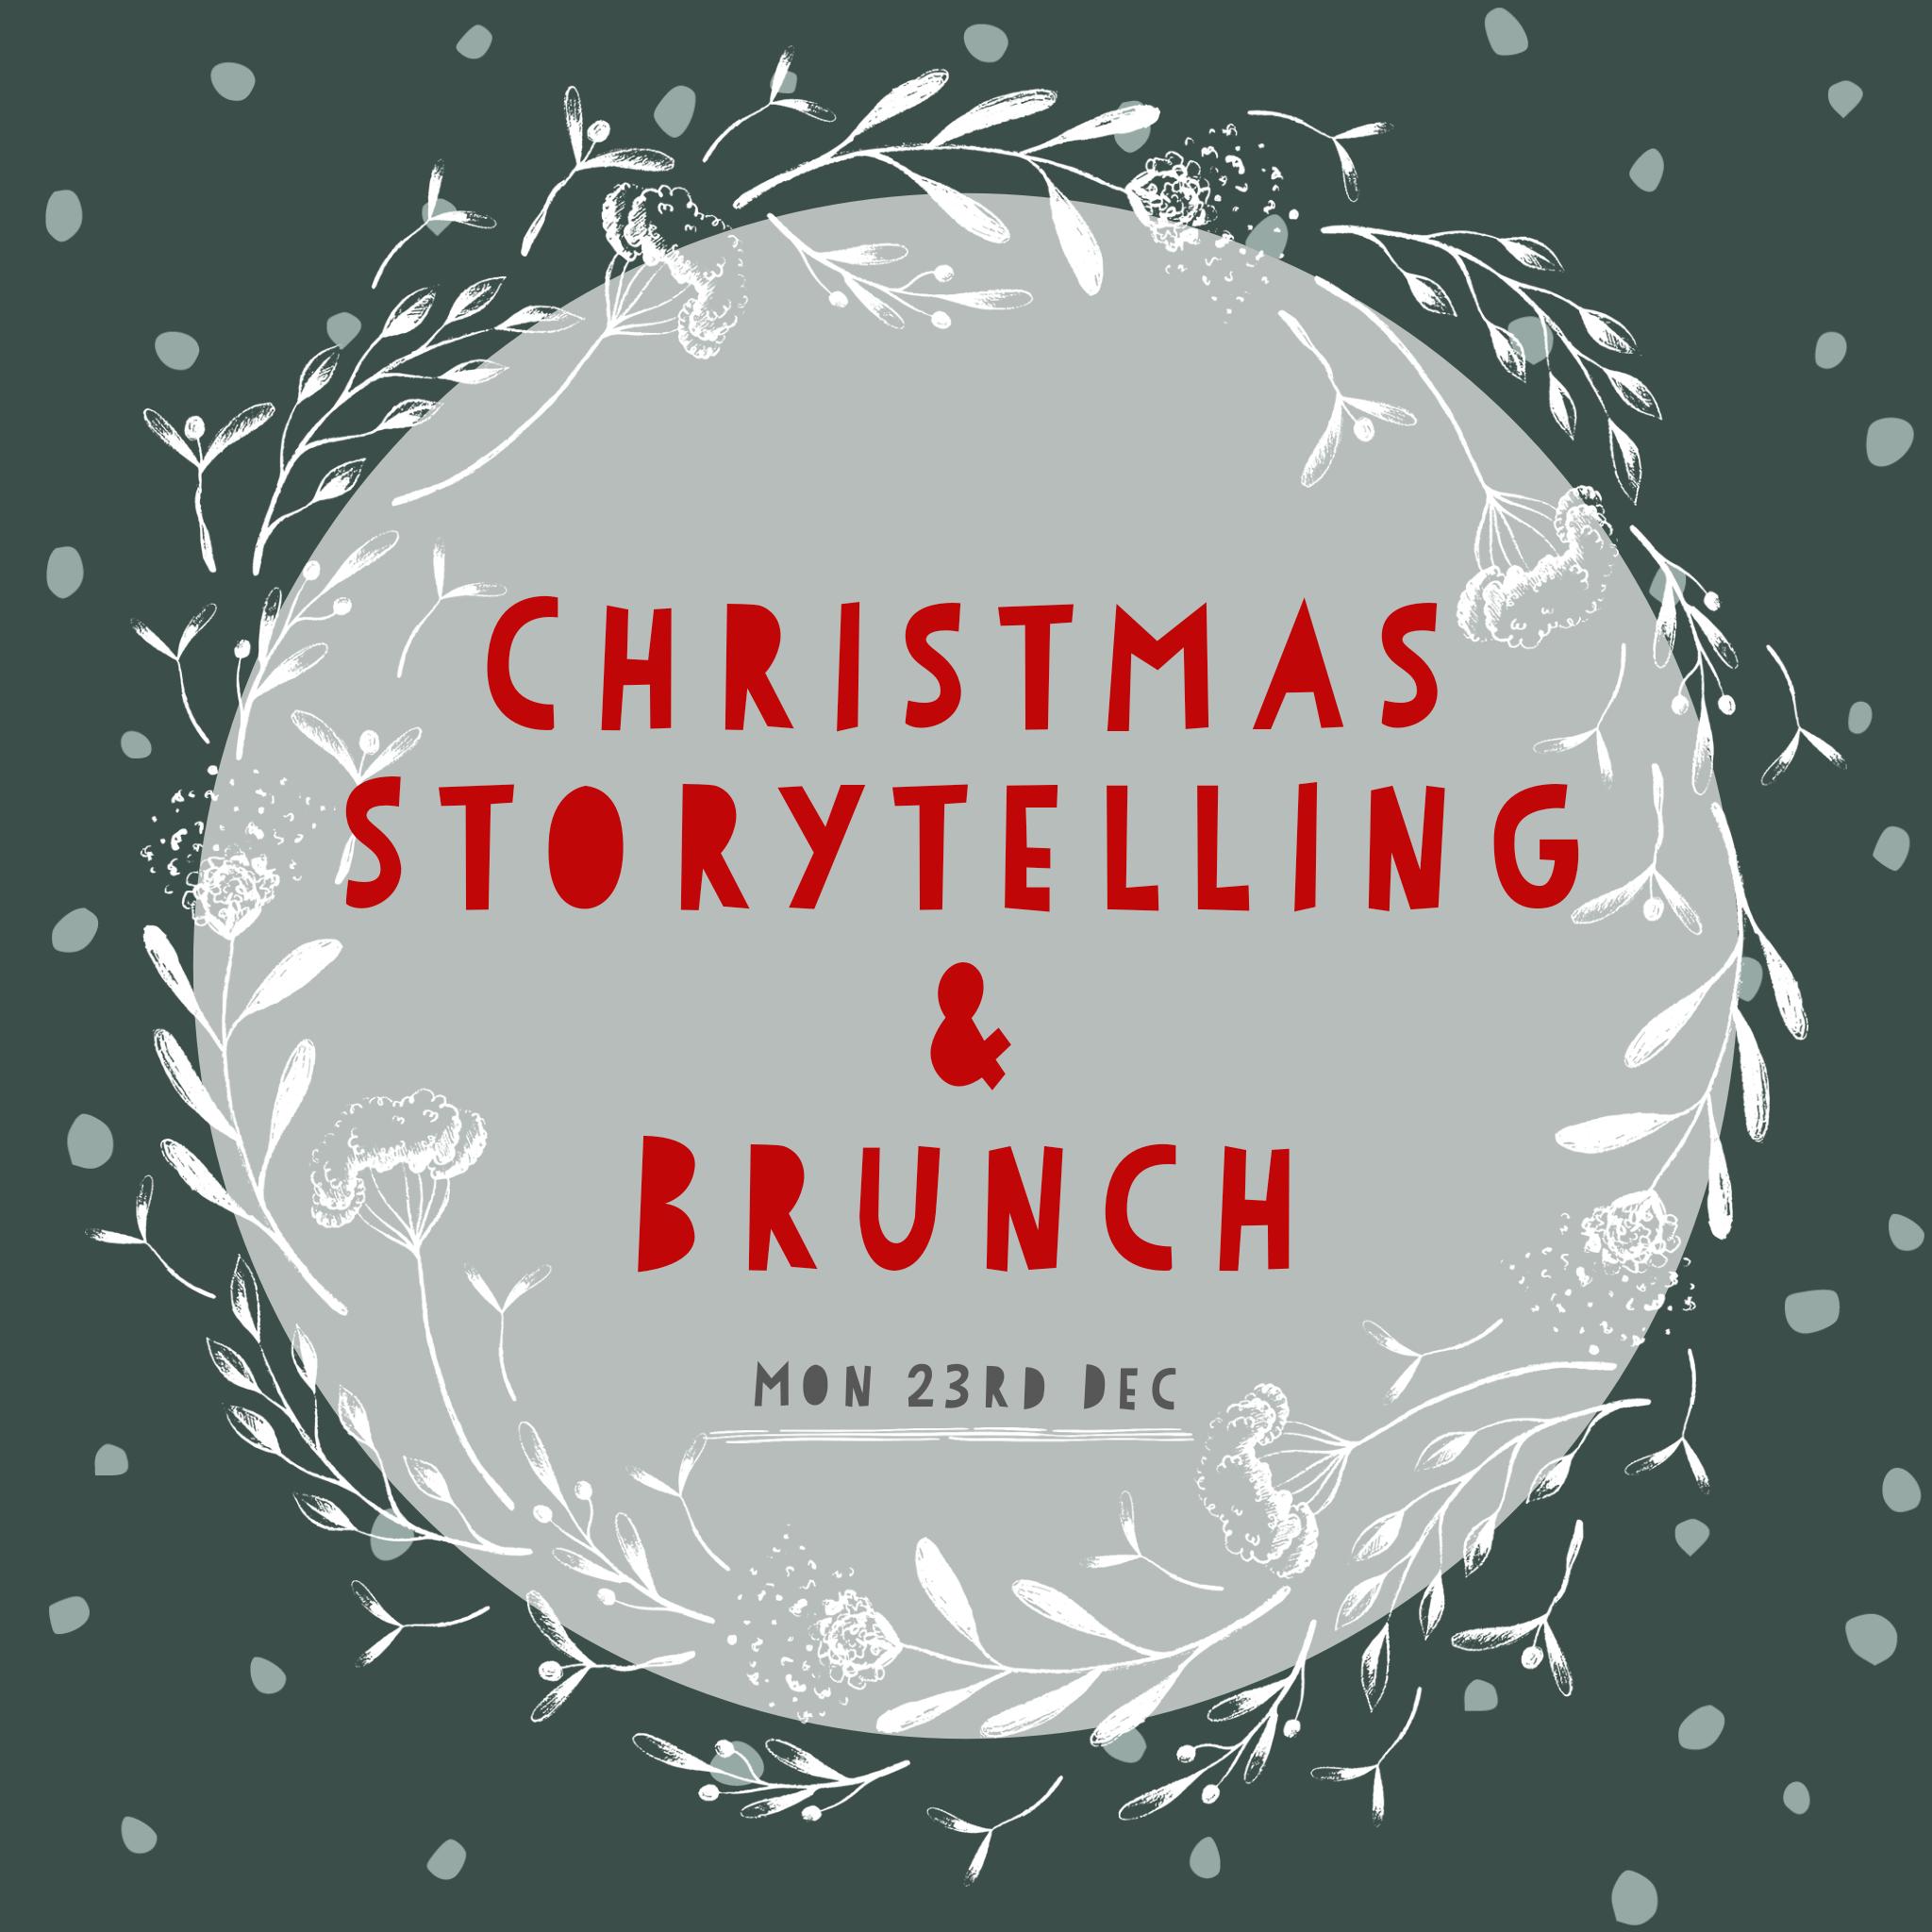 Christmas Storytelling & Brunch